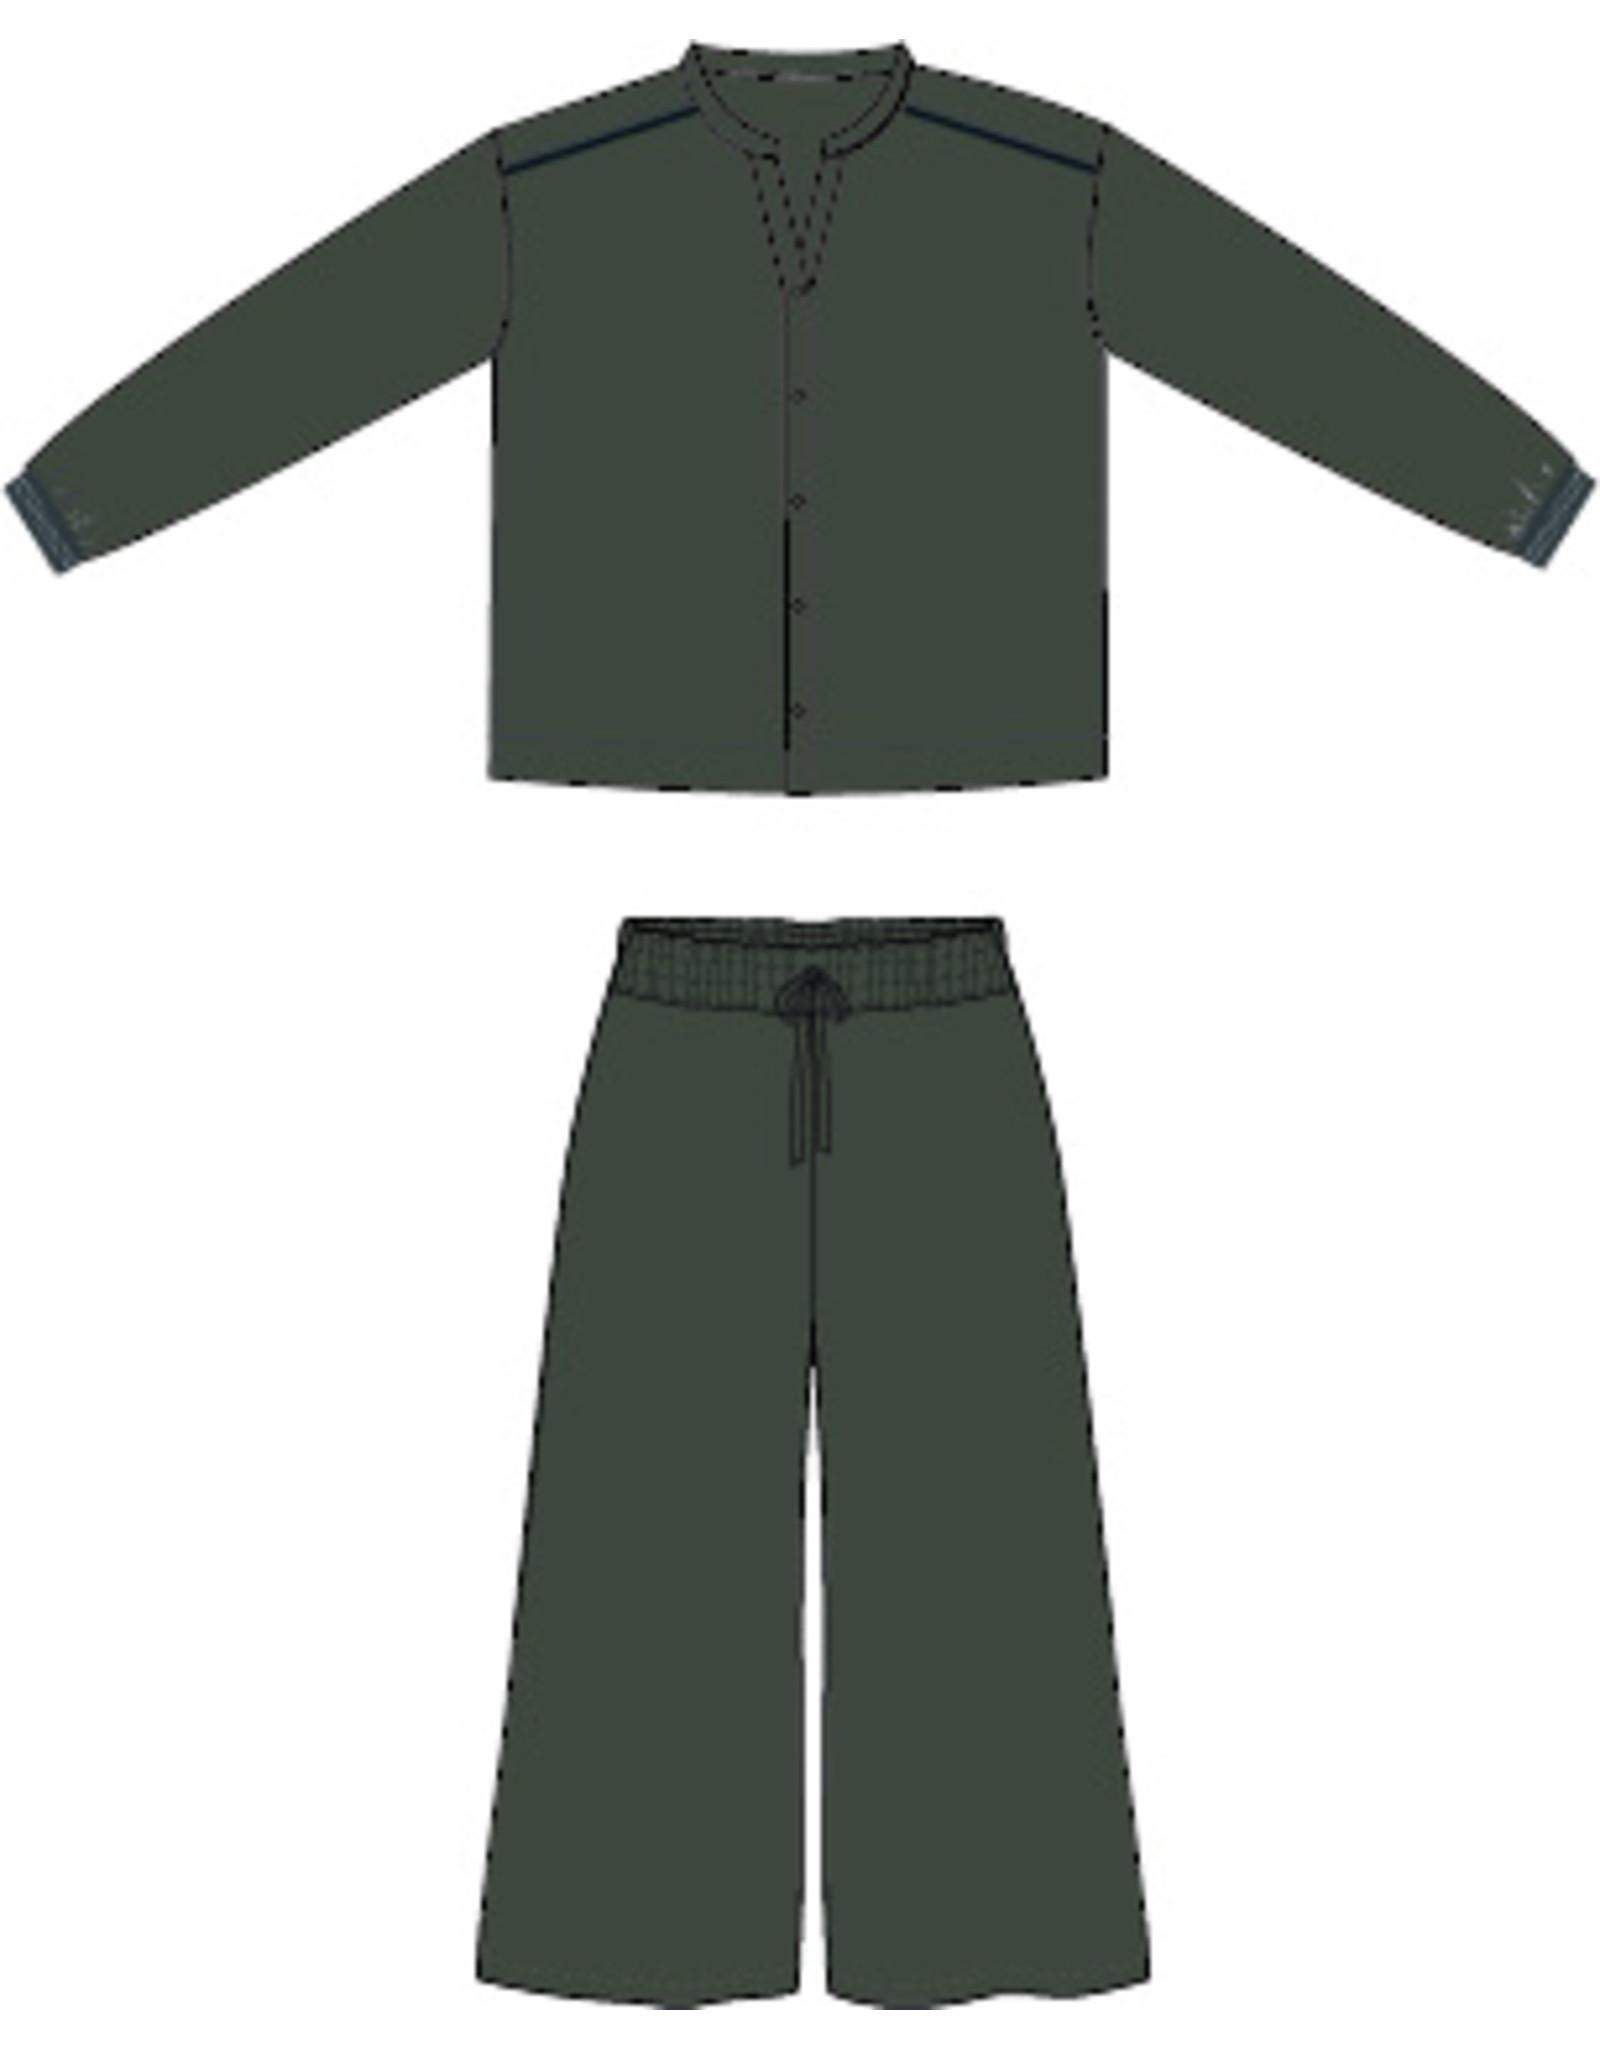 Dorélit Diane + Alkes | Pajama Set Woven | Black